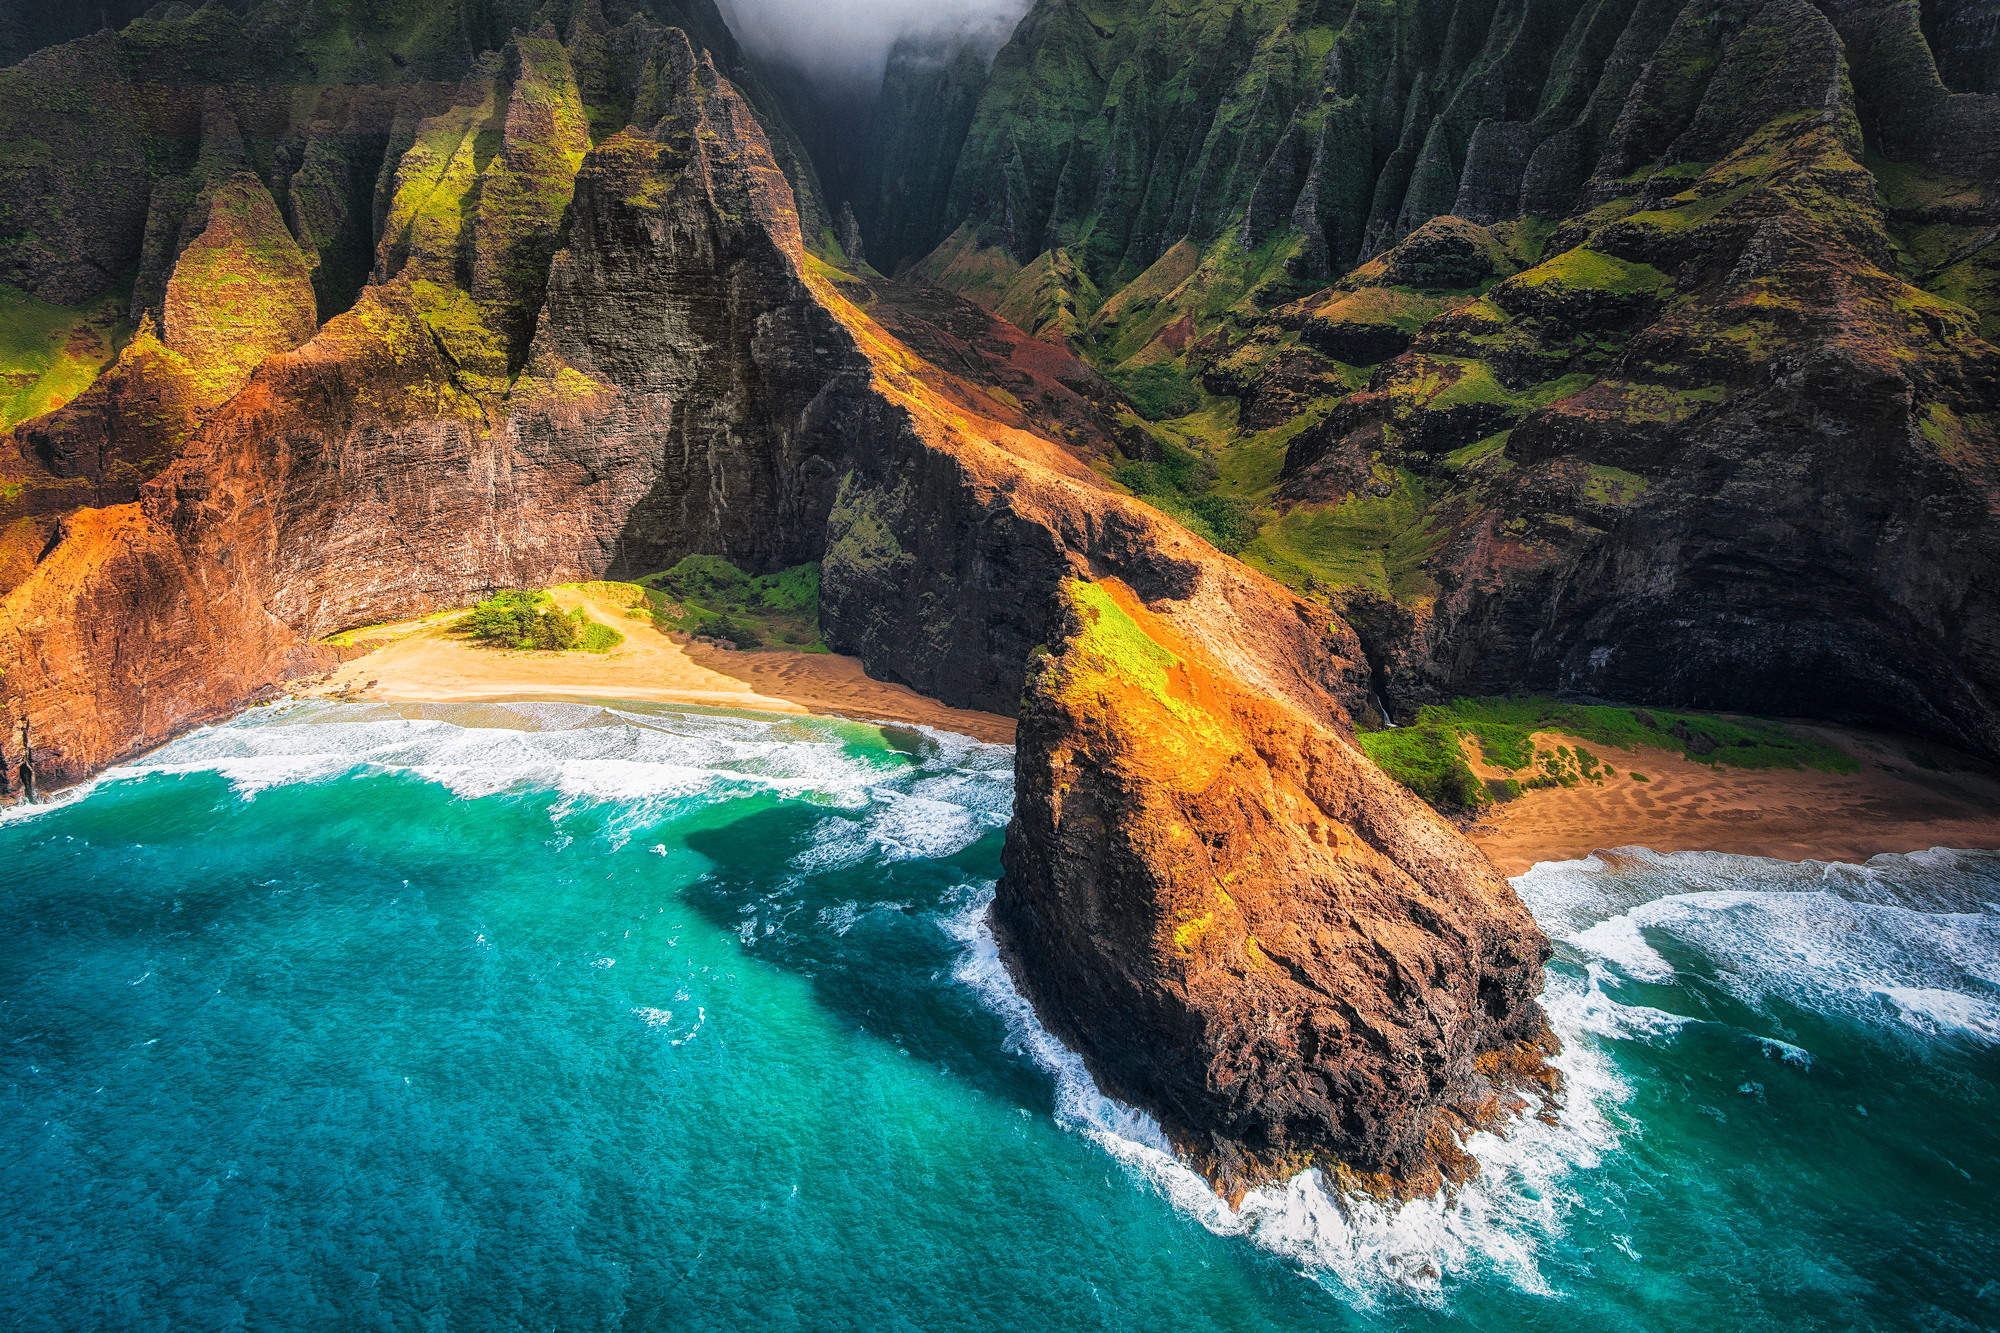 Coast Of Kauai Hawaii Hd Wallpaper Background Image 2000x1333 Id 749626 Wallpaper Abyss